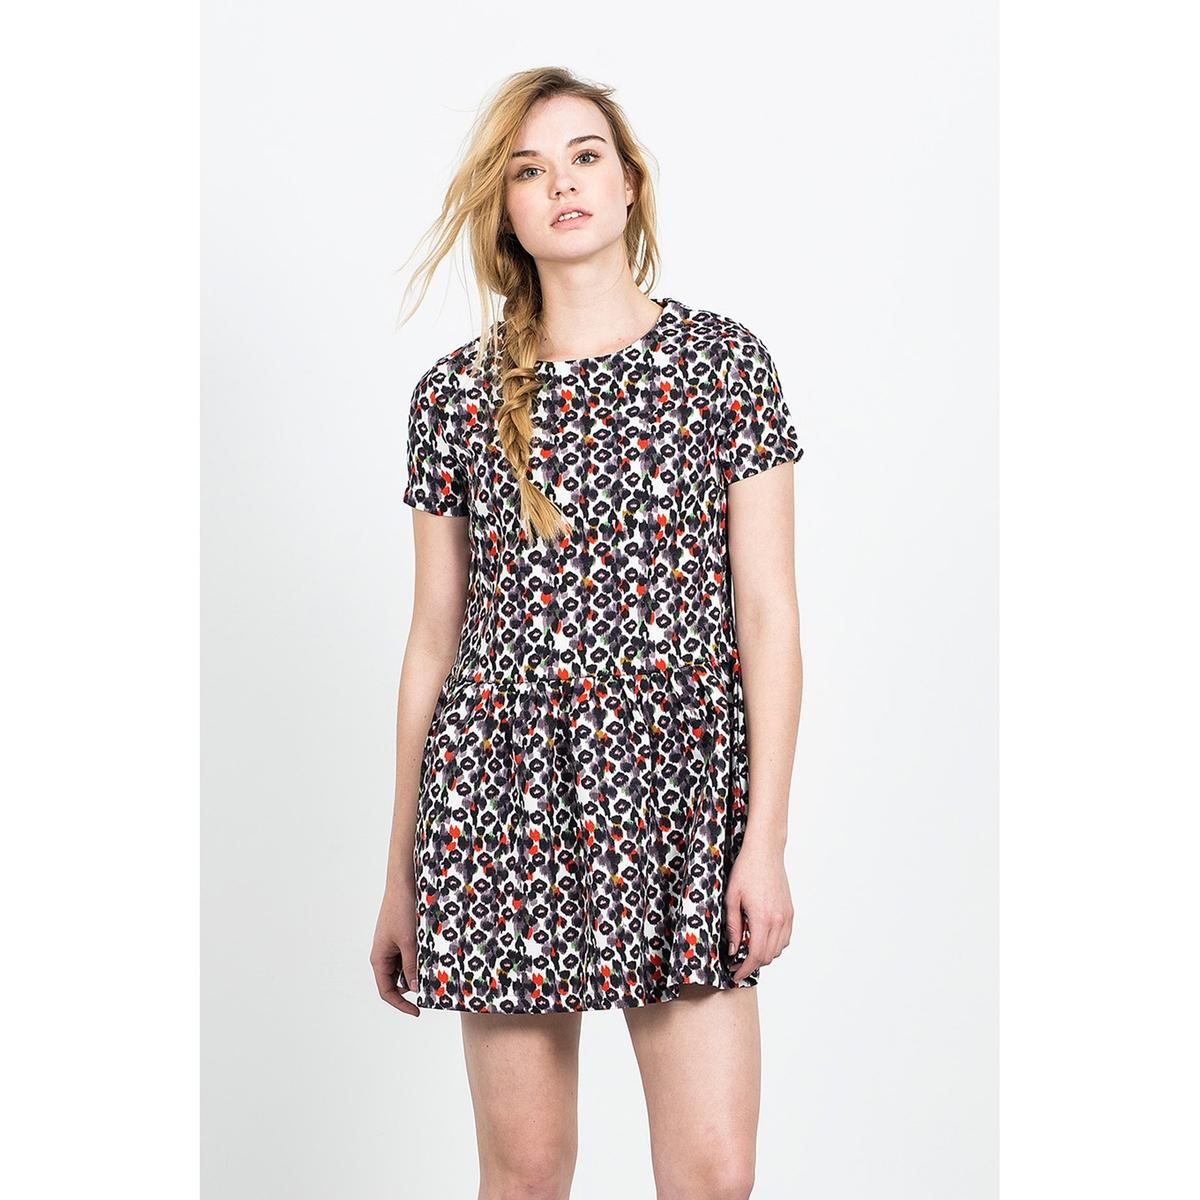 Короткое расклешённое платье с короткими рукавами AZTECA SKIRT lace insert fitted faux leather skirt